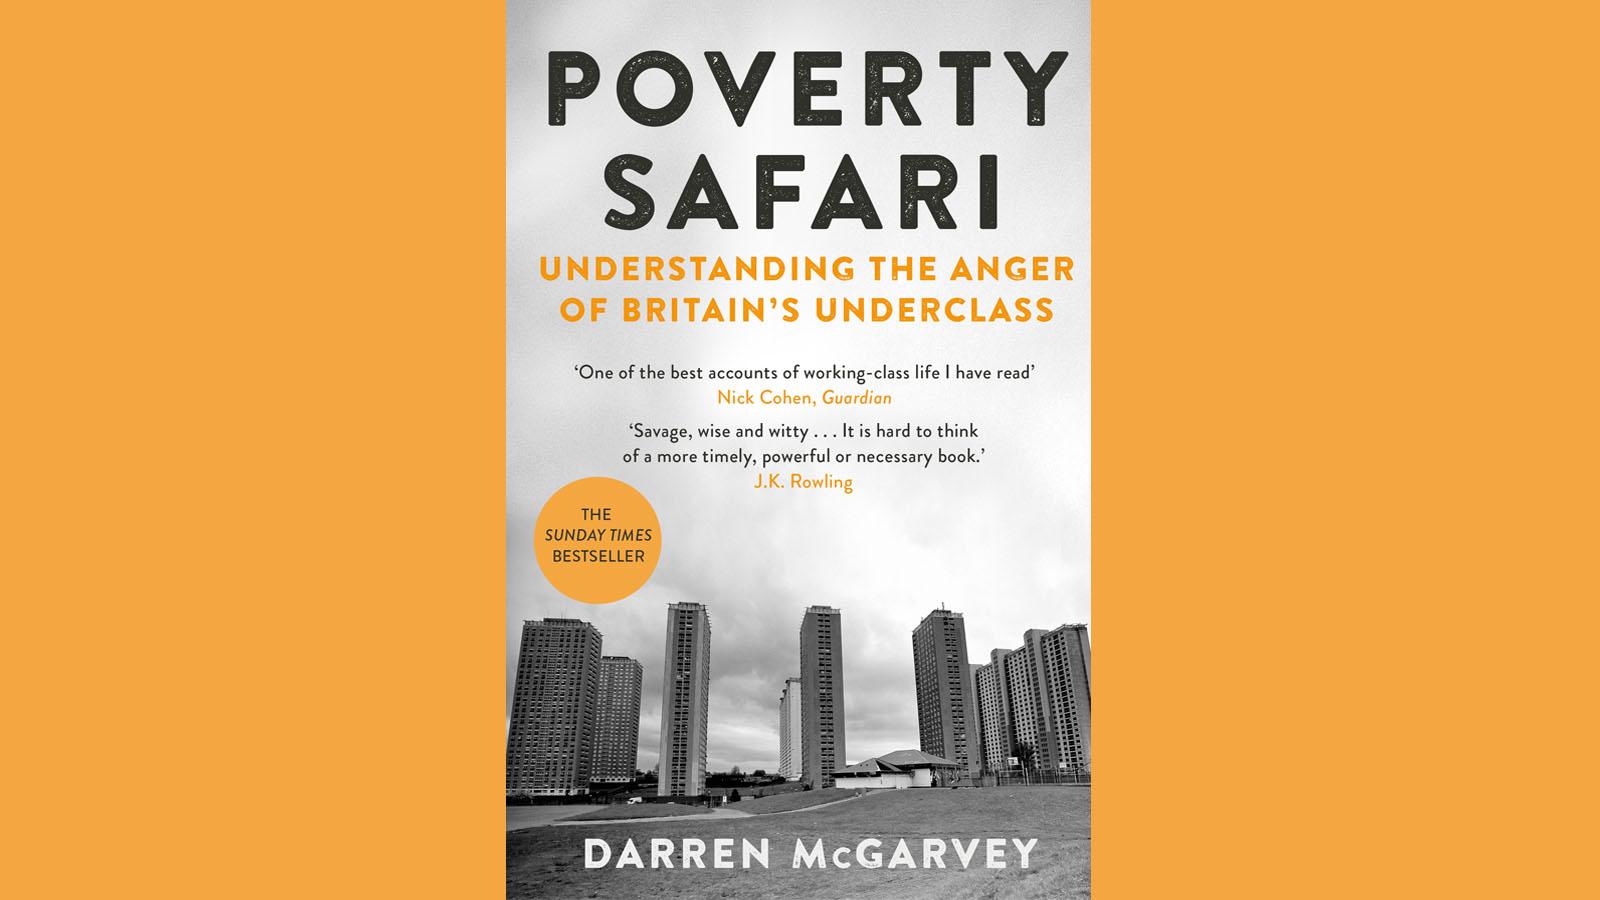 Даррен Мак-Ґарві: Сафарі бідності